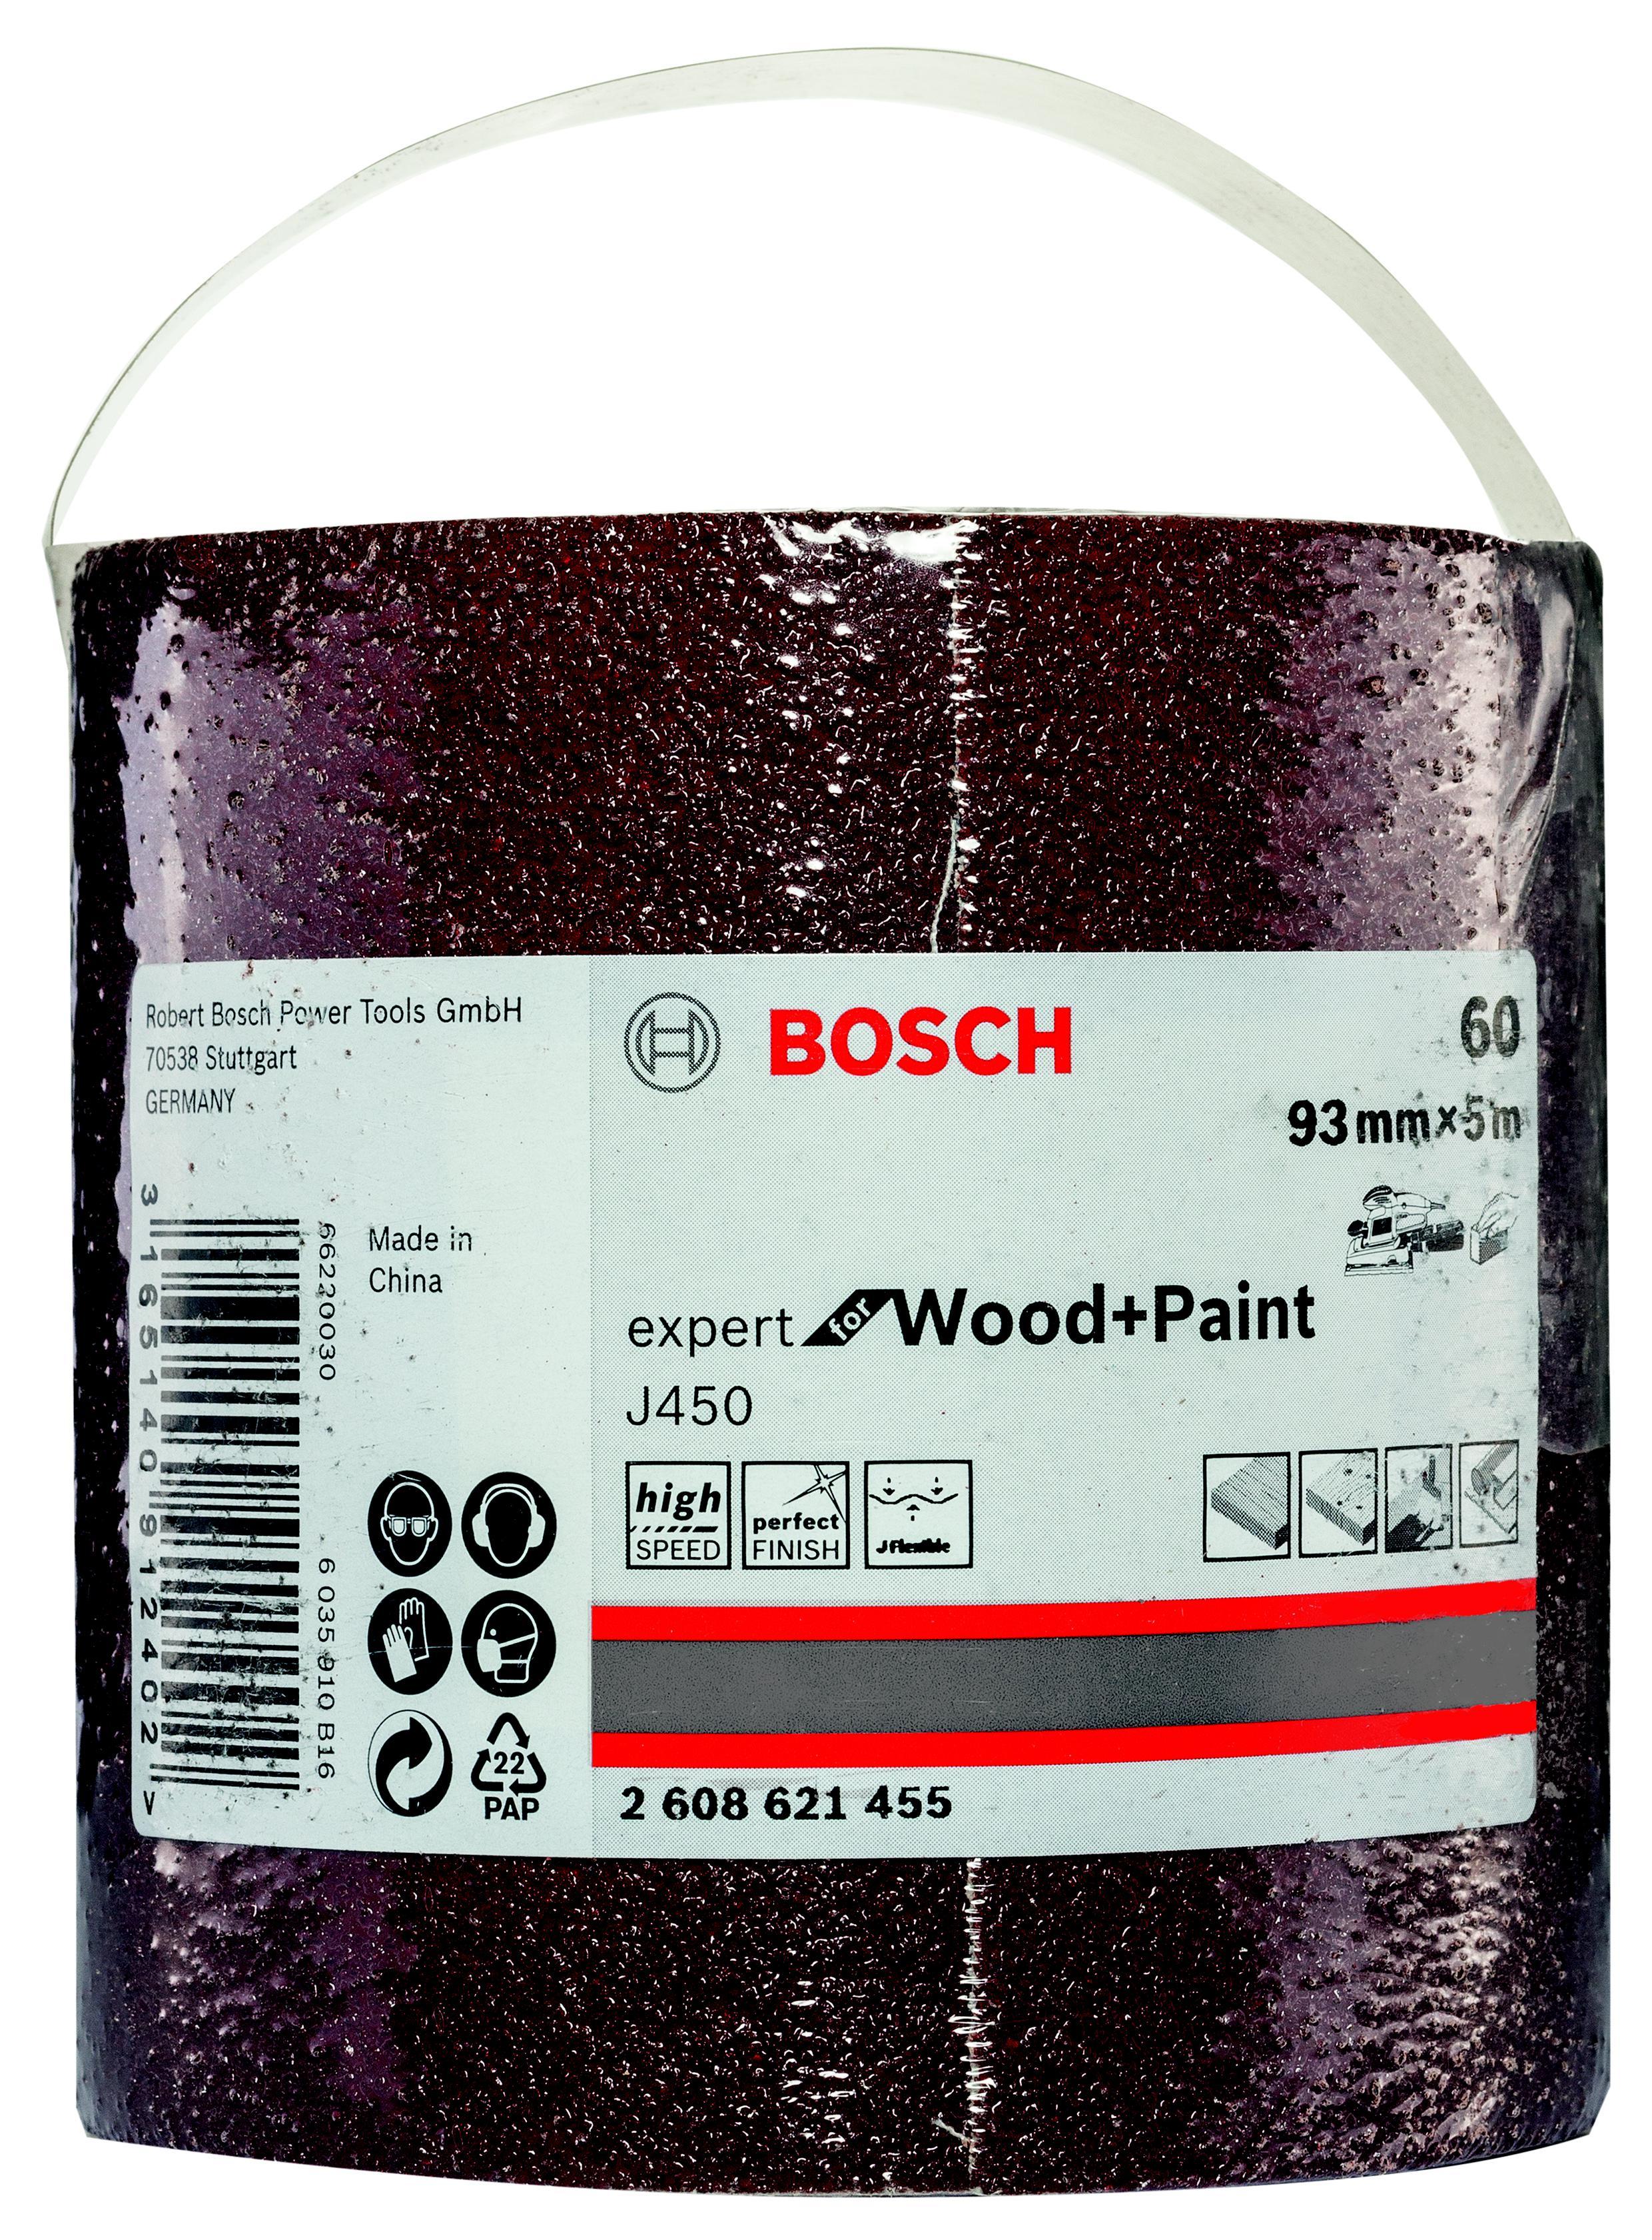 Шкурка шлифовальная в рулоне Bosch 93x5000 мм g60 (2.608.621.455)